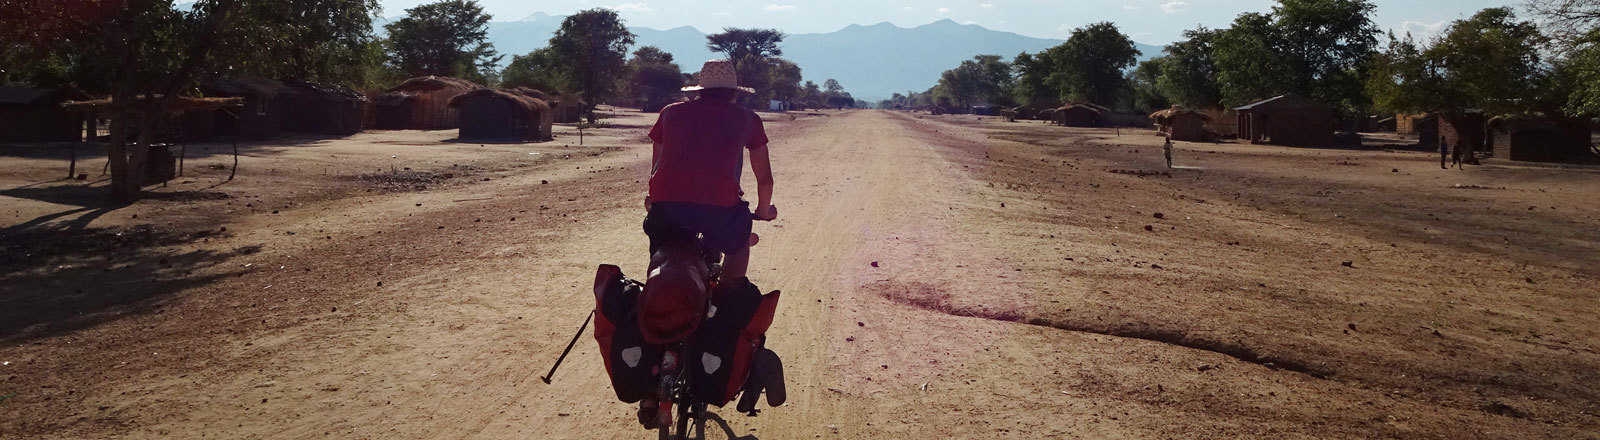 Anselm Nathanael Pahnke mit dem Fahrrad unterwegs in Malawi